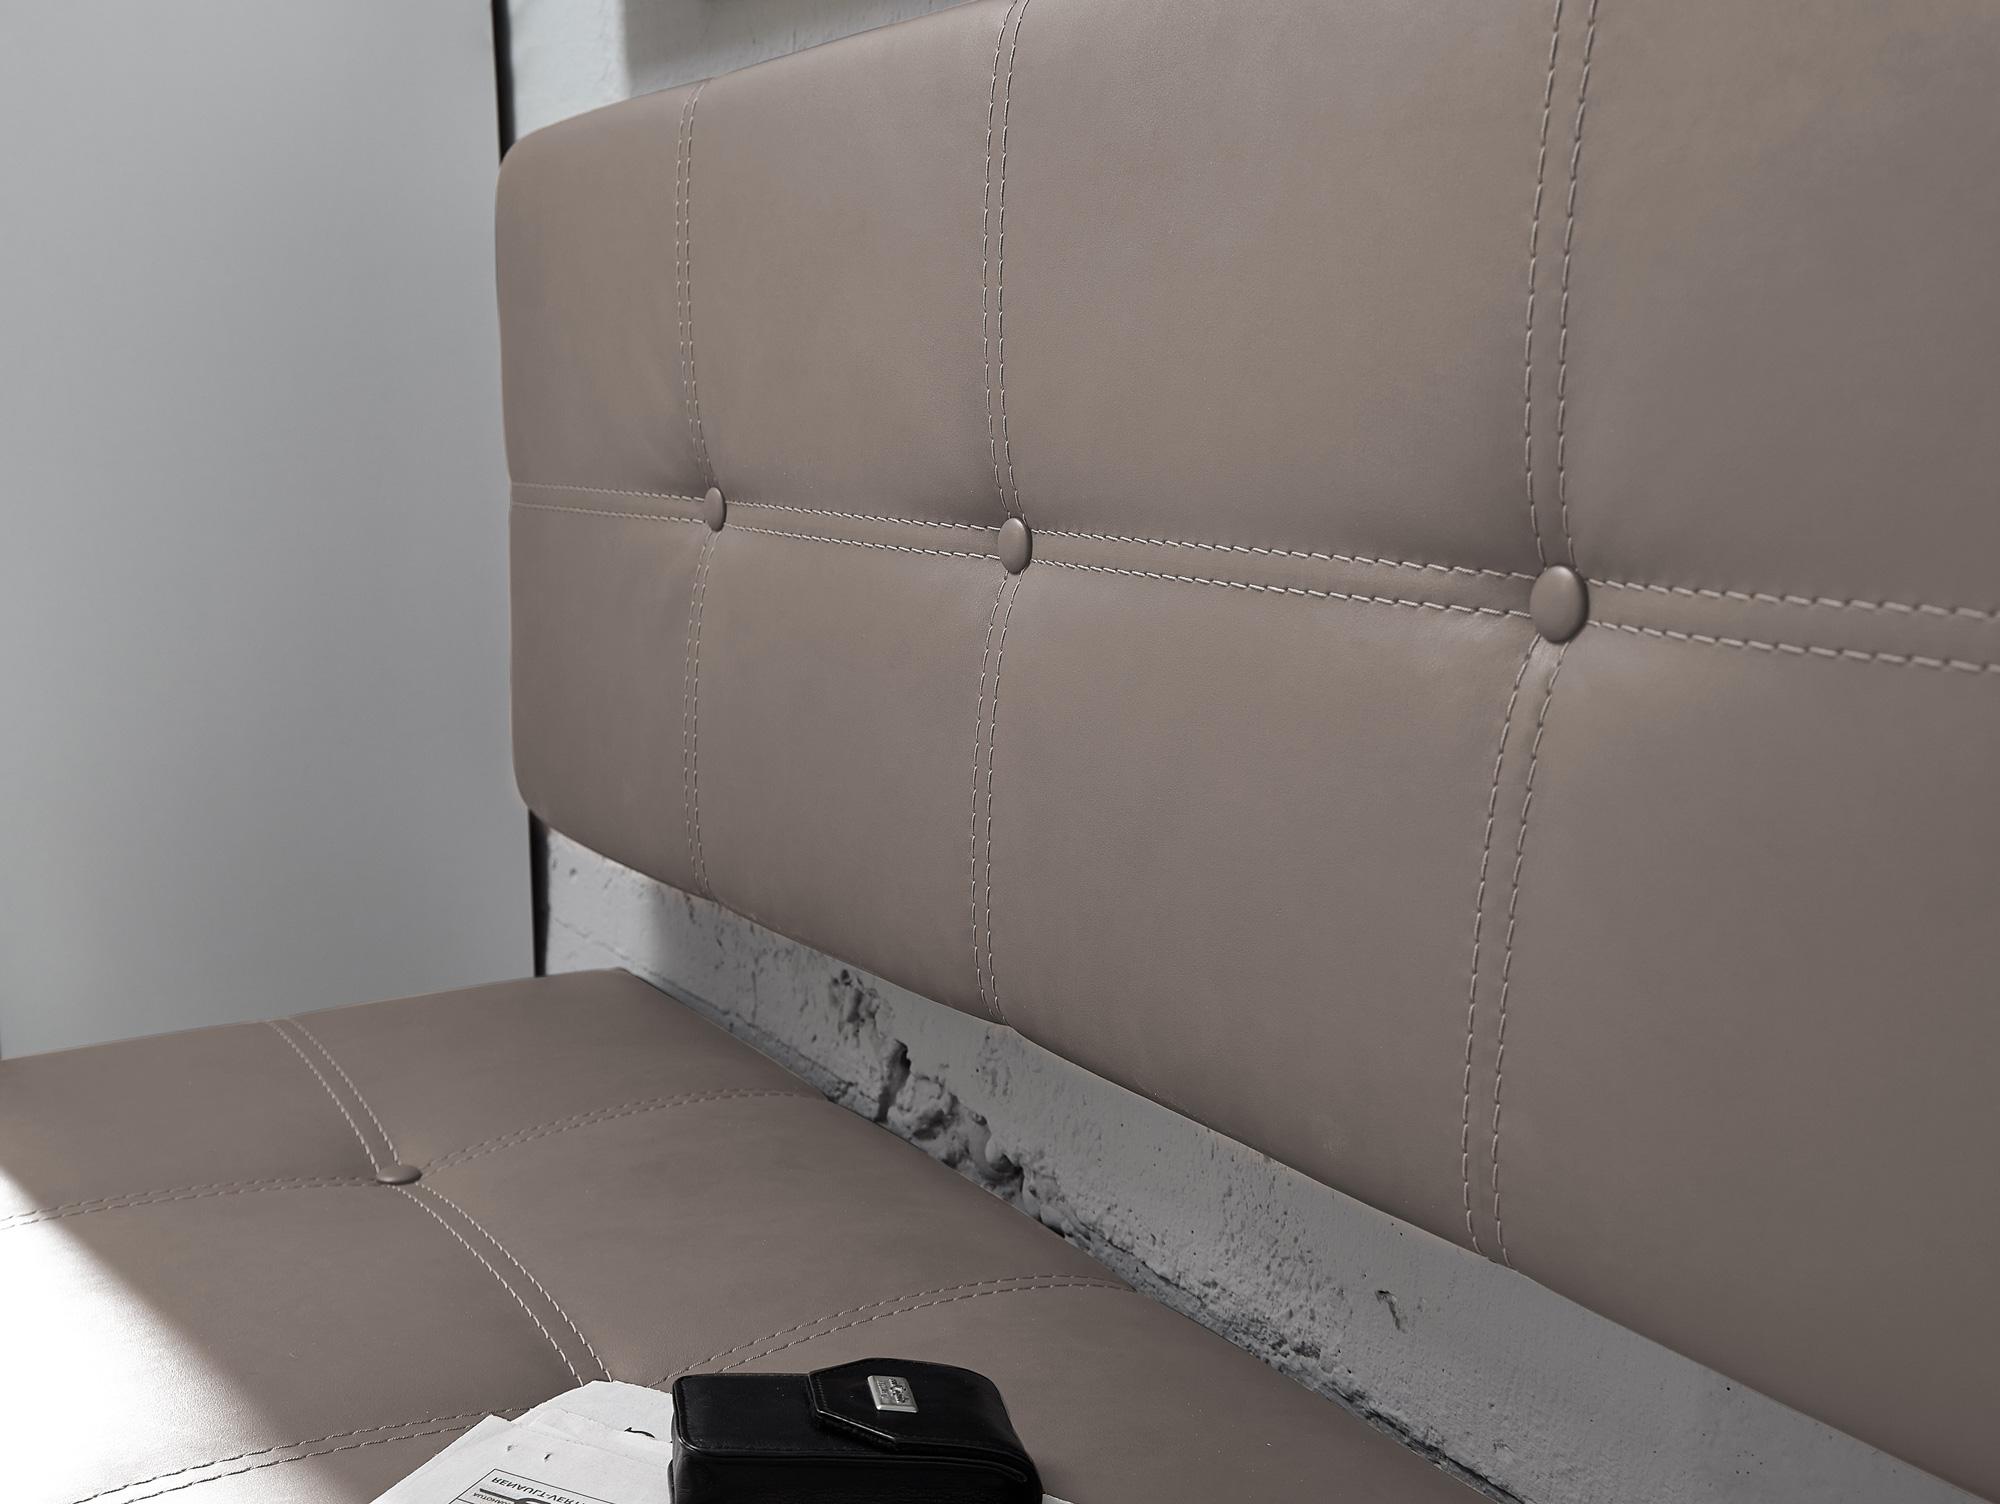 rene bank schuhbank weiss hg grau. Black Bedroom Furniture Sets. Home Design Ideas